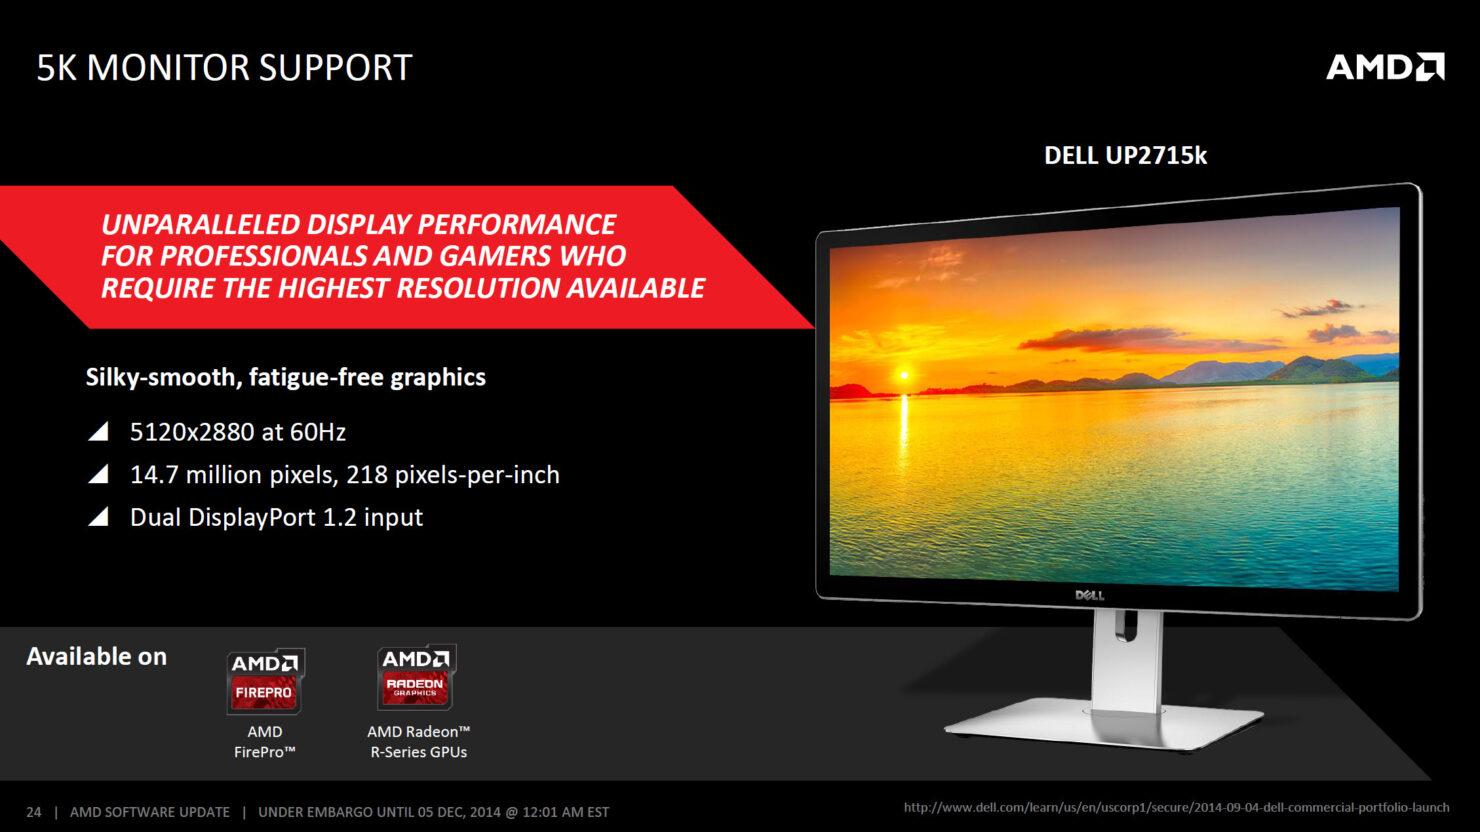 amd-catalyst-omega-driver-14-50_5k-monitor-support-dellup2715k